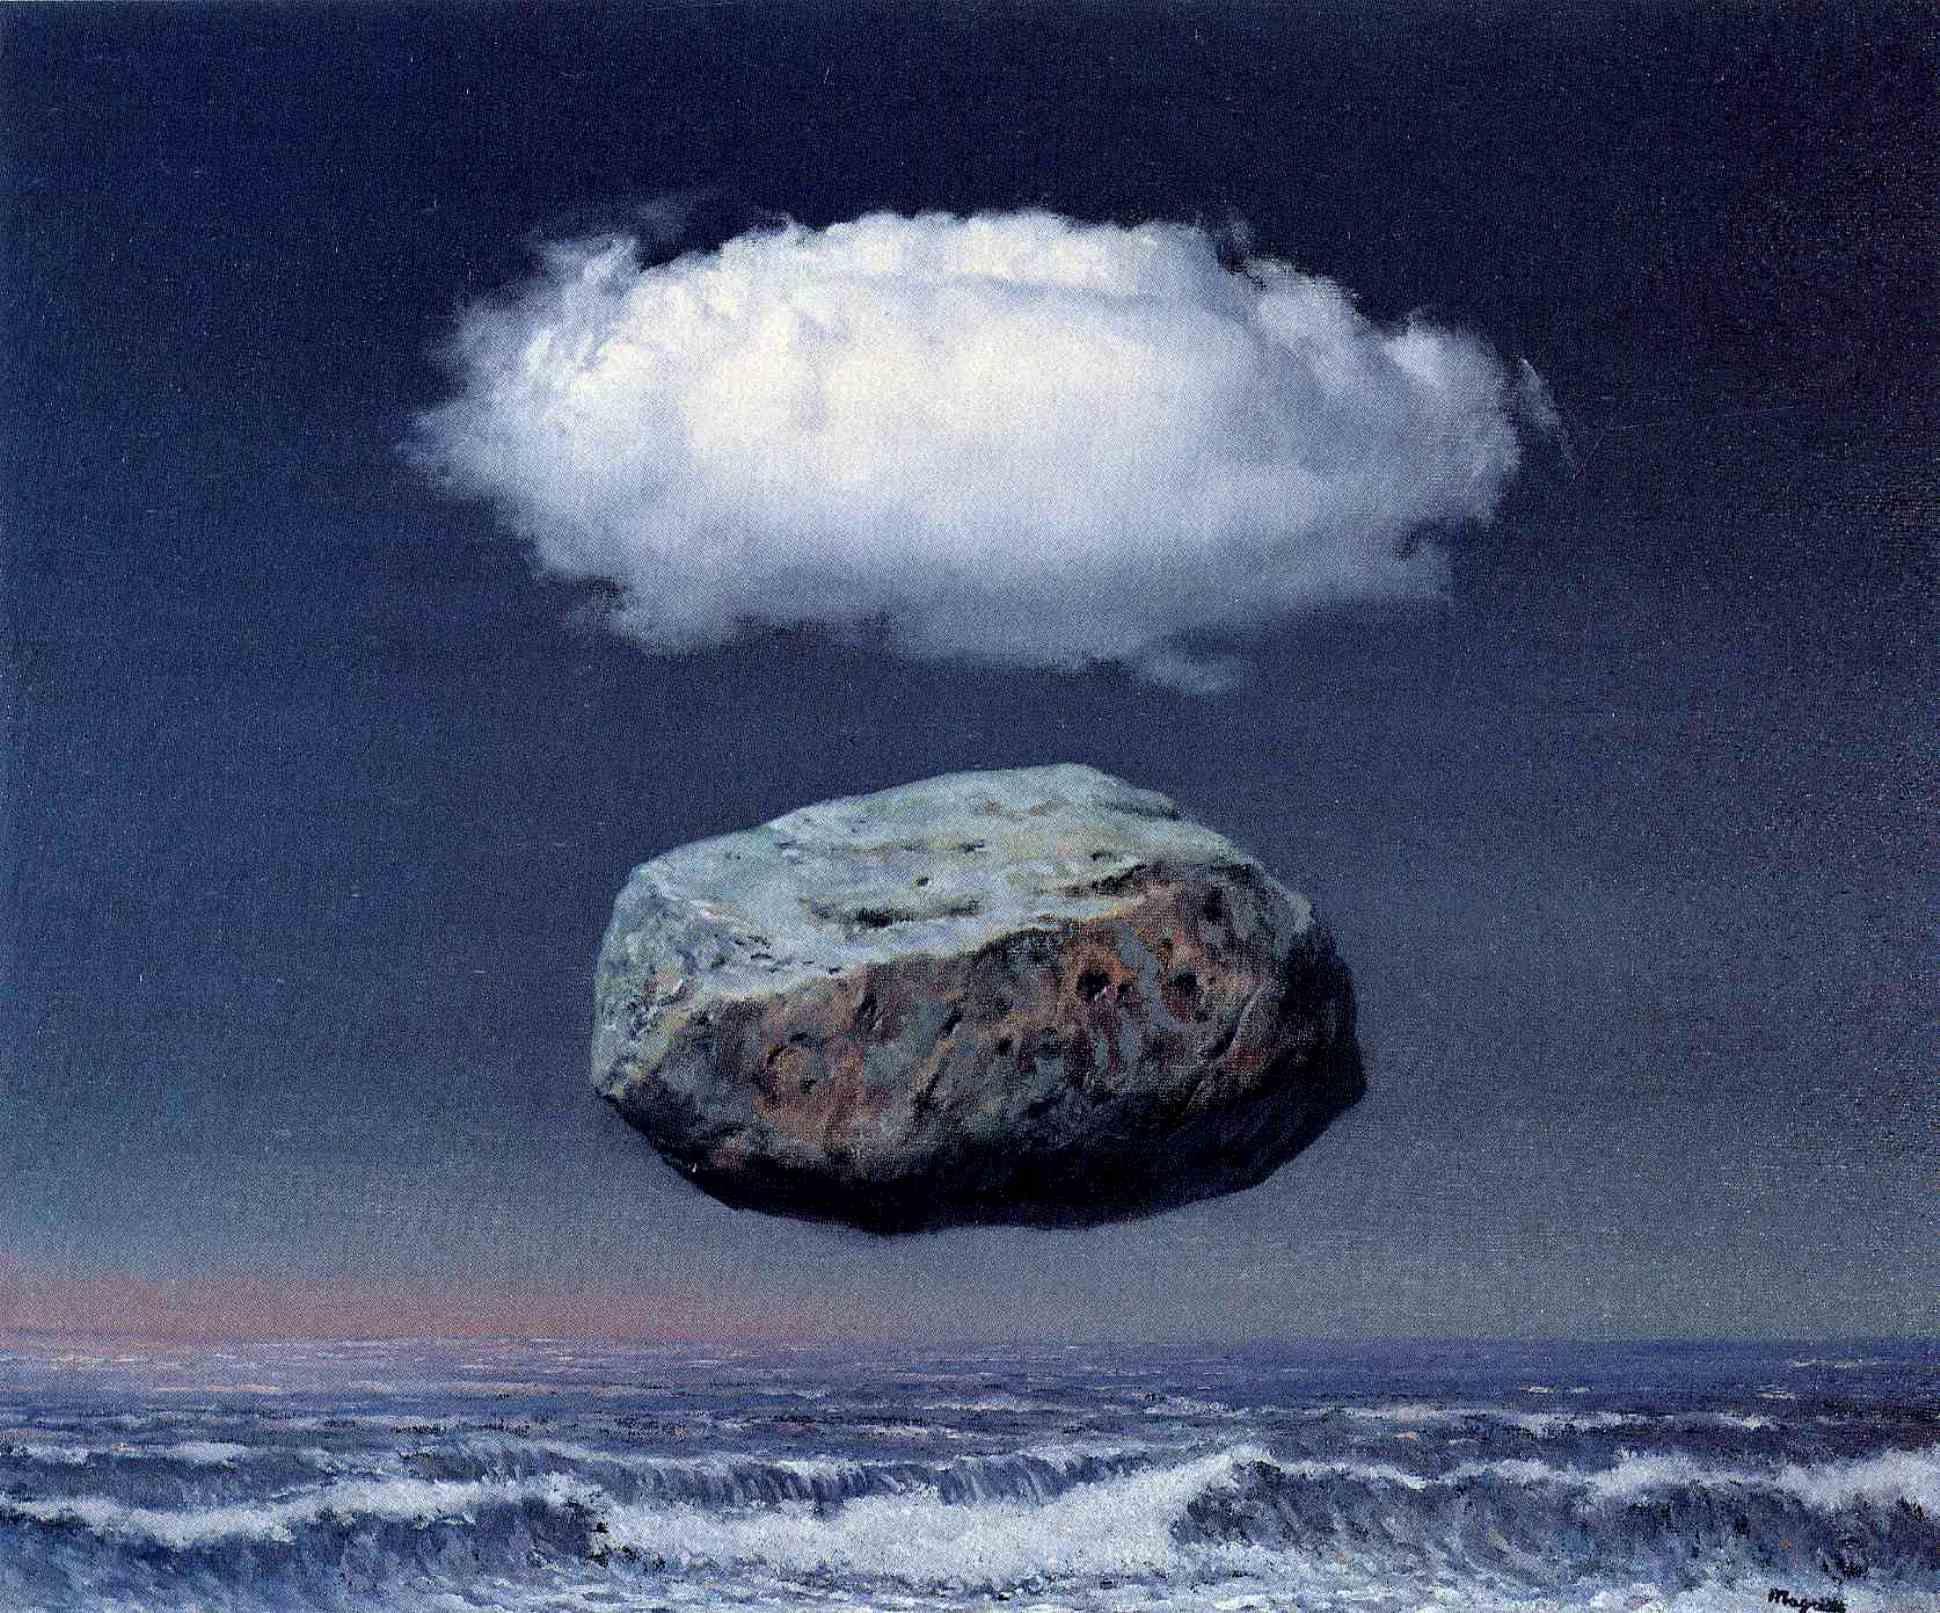 Rene Magritte Bel ルネ マグリット 白 ルネ マグリット マグリット シュルレアリスムアート